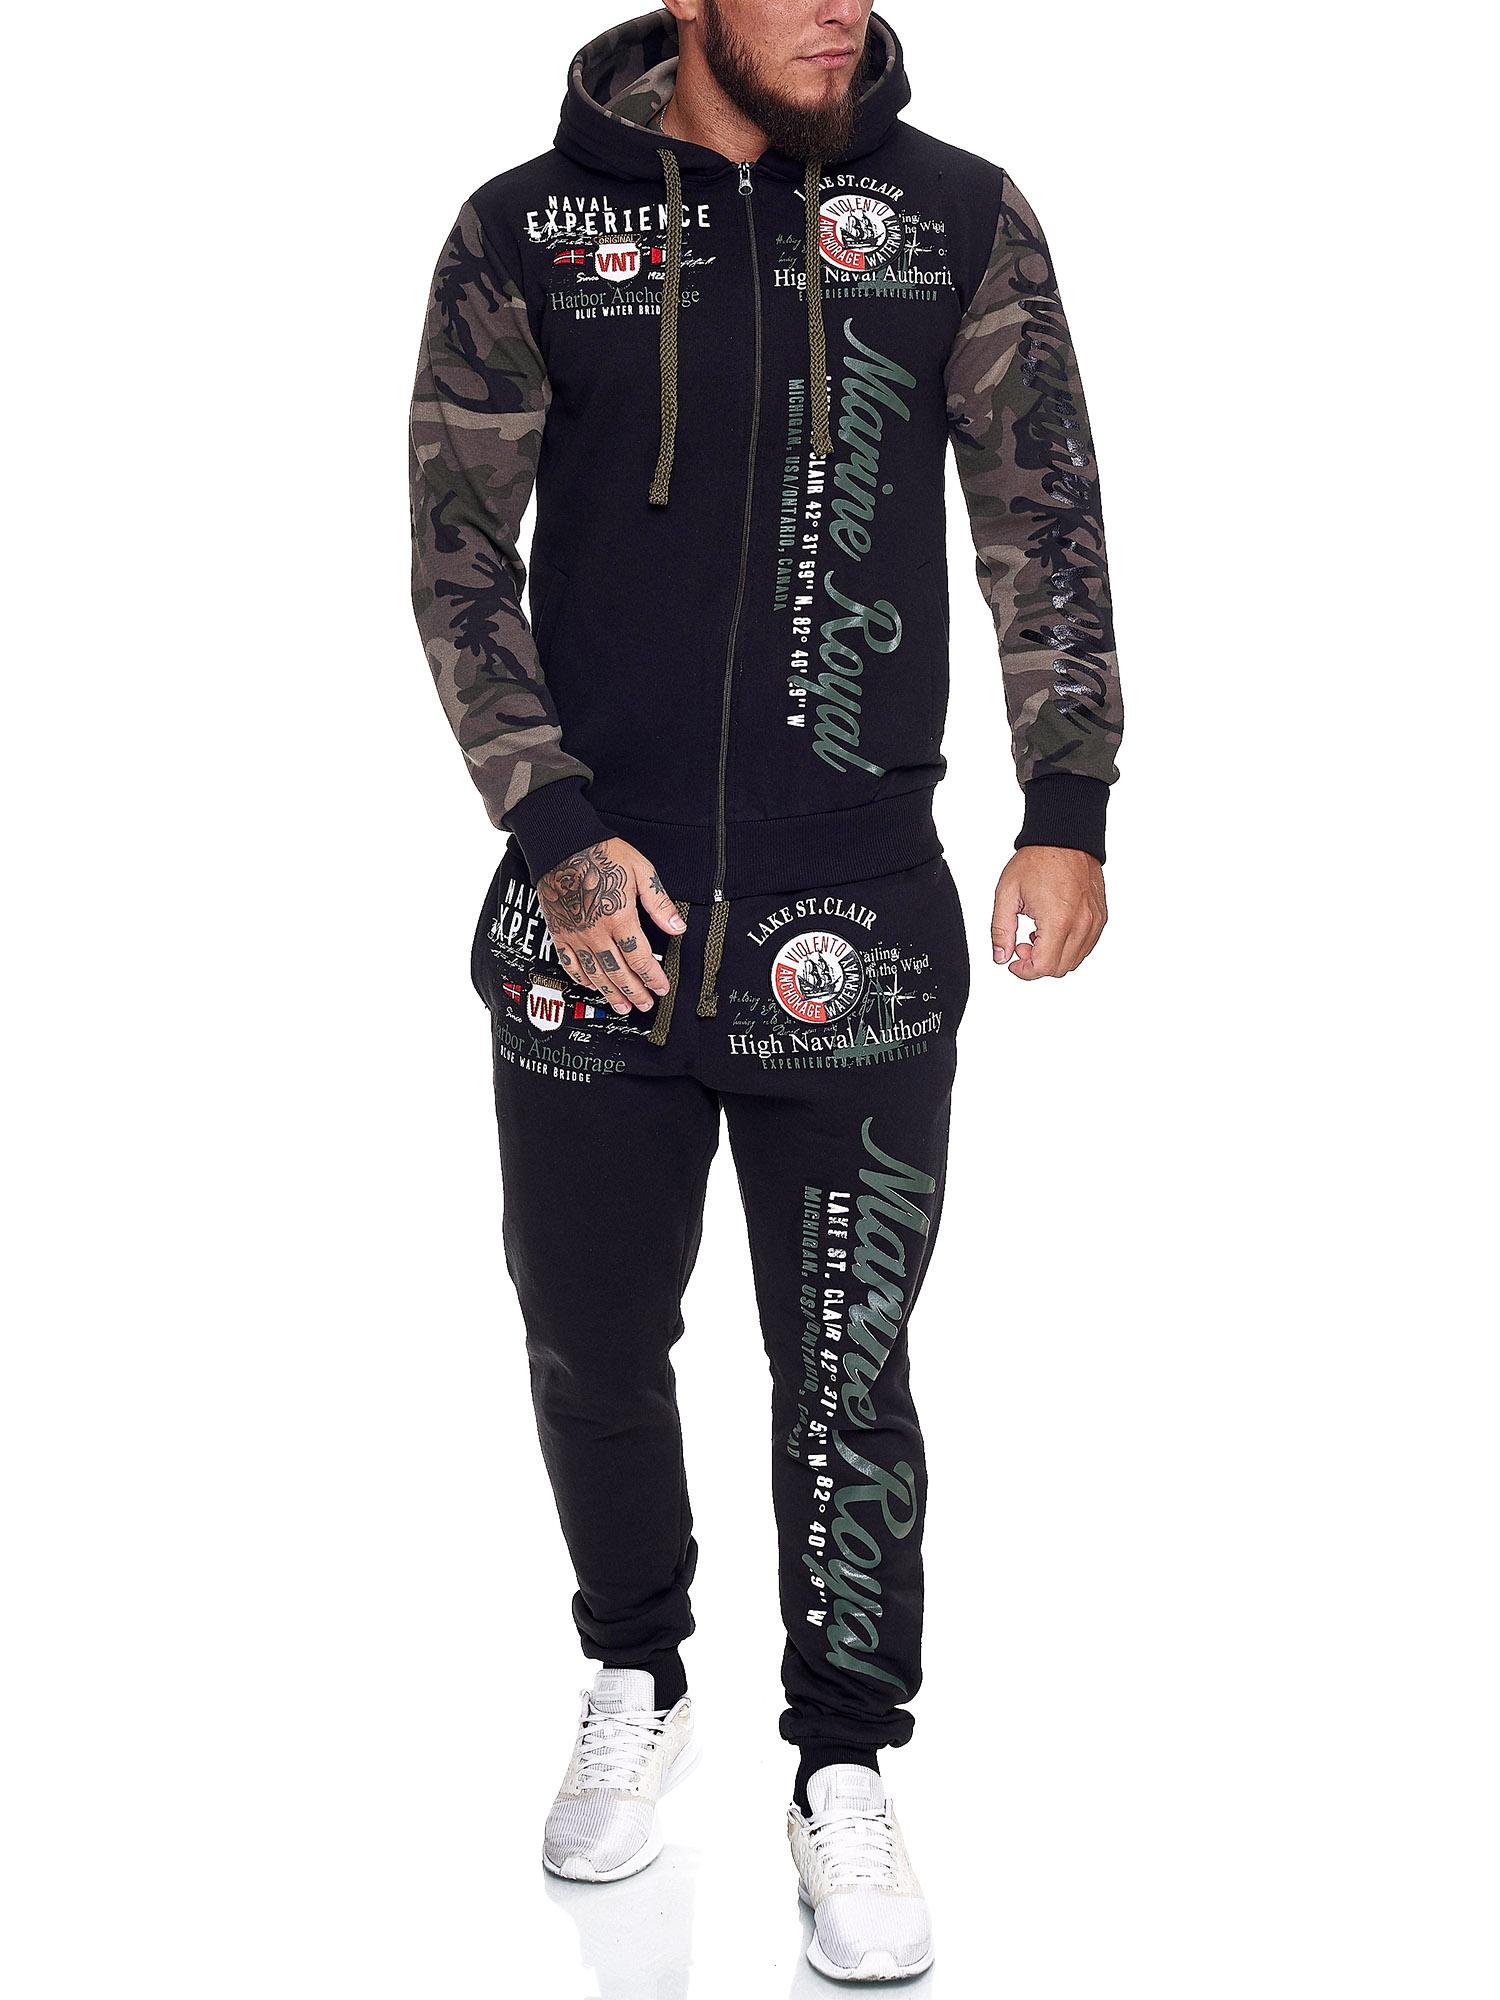 Damen-Jogginganzug-Frauen-Trainingsanzug-Sportanzug-Streetwear-JG-512-John-Kayna Indexbild 53